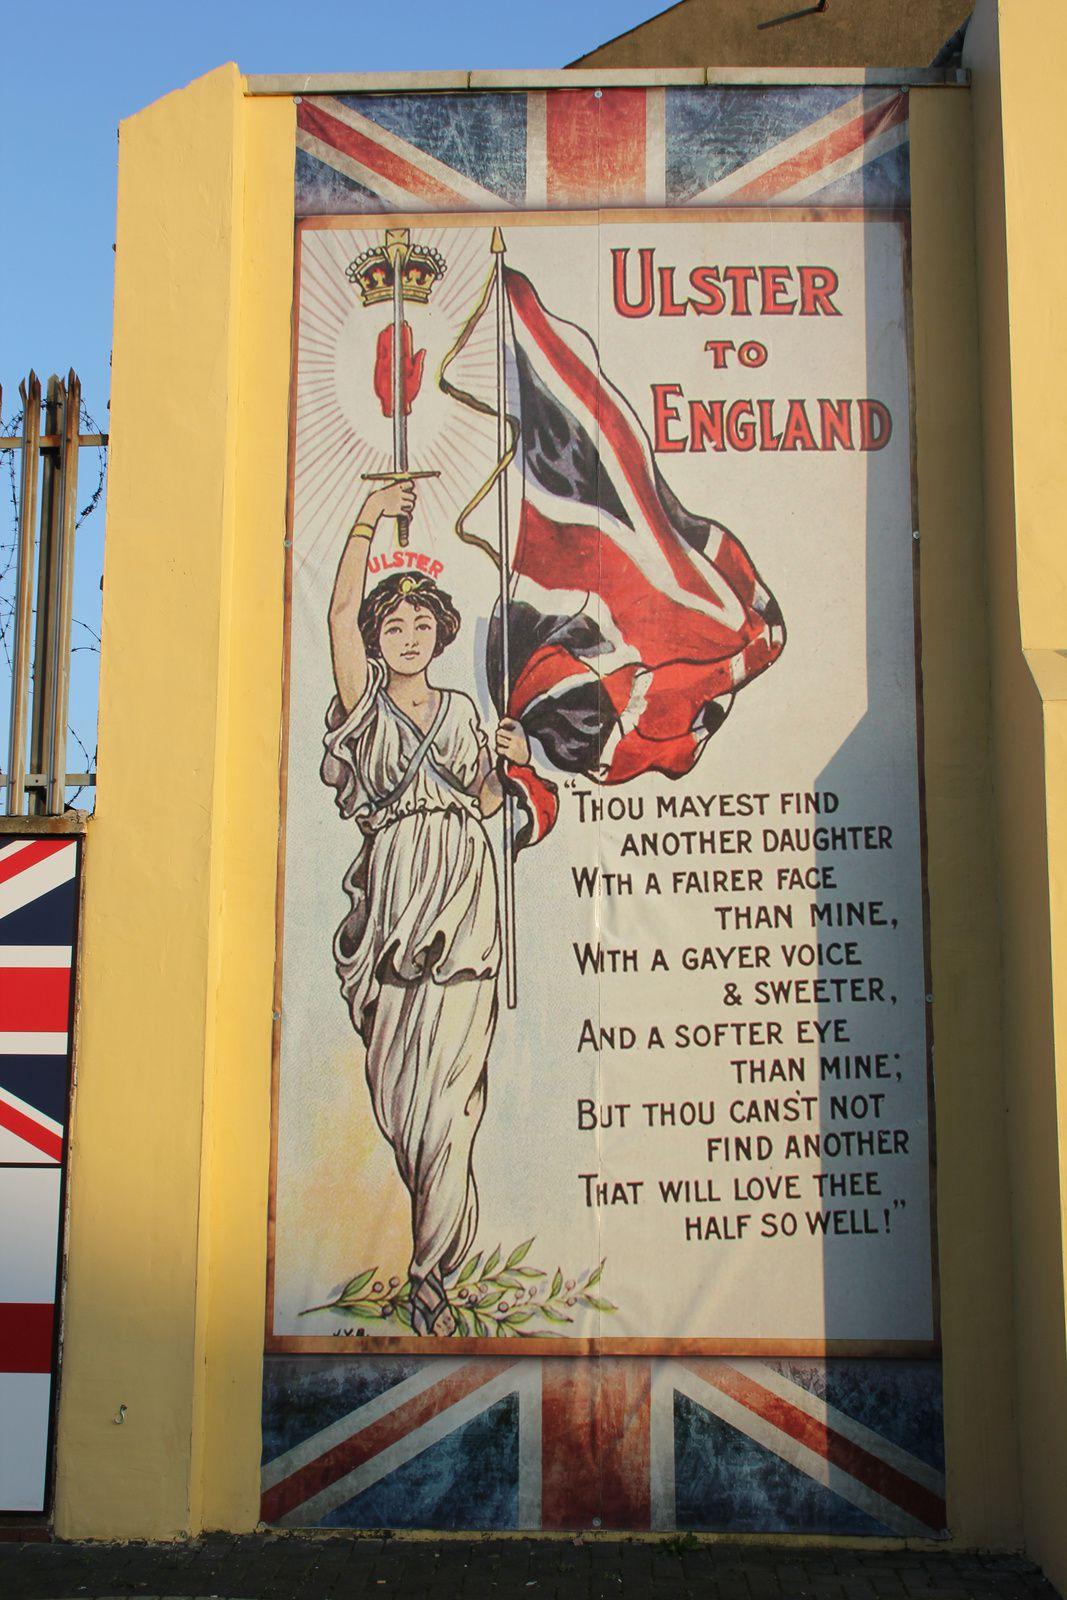 482) Crimea Street, Shankill, West Belfast